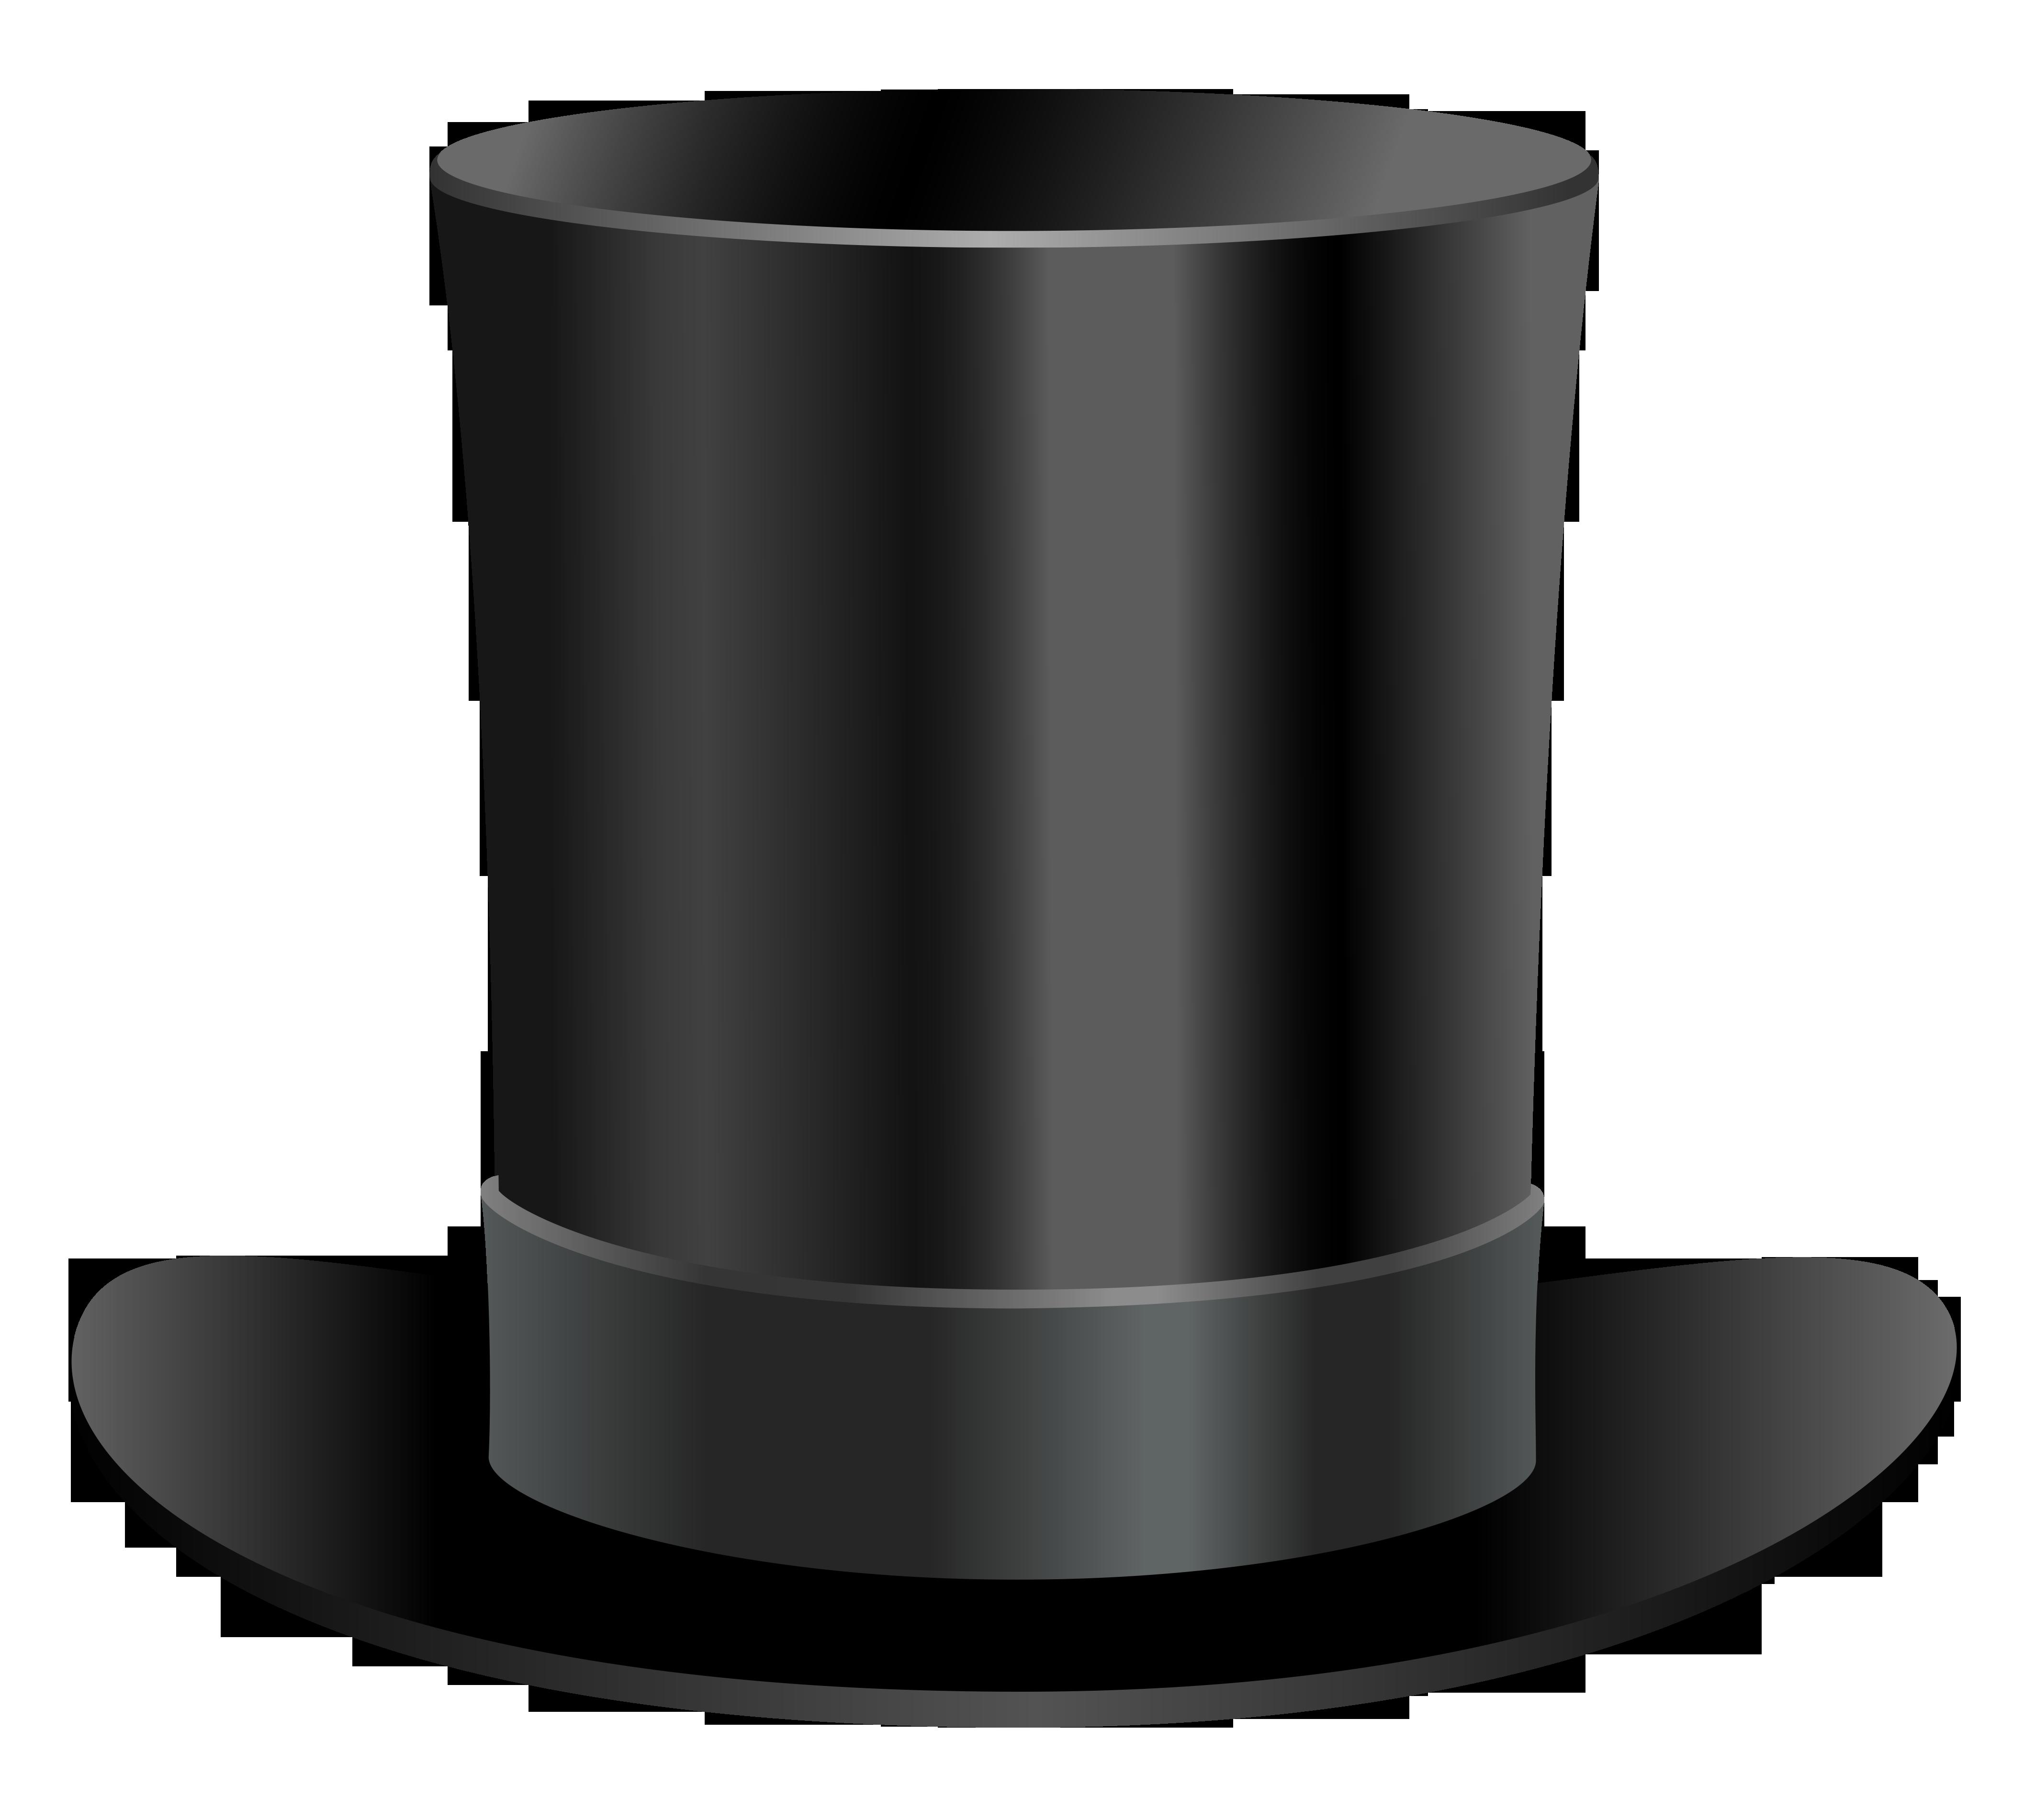 clipart download Black Top Hat PNG Clipart